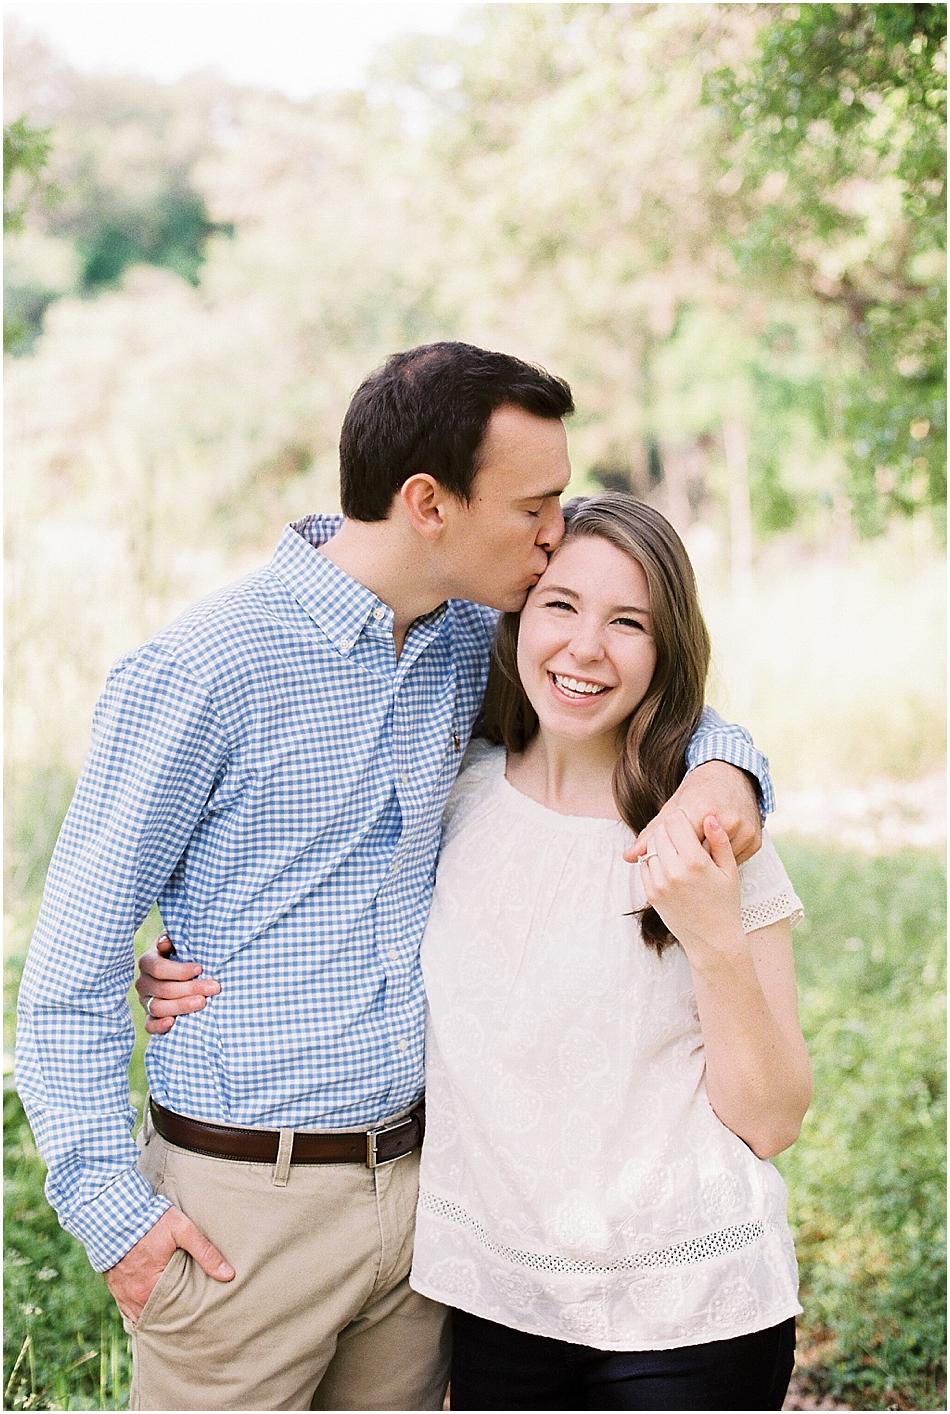 Laura + Nick | Engagement | Fine Art Film | Austin Texas | Emilie Anne Photography-20.jpg